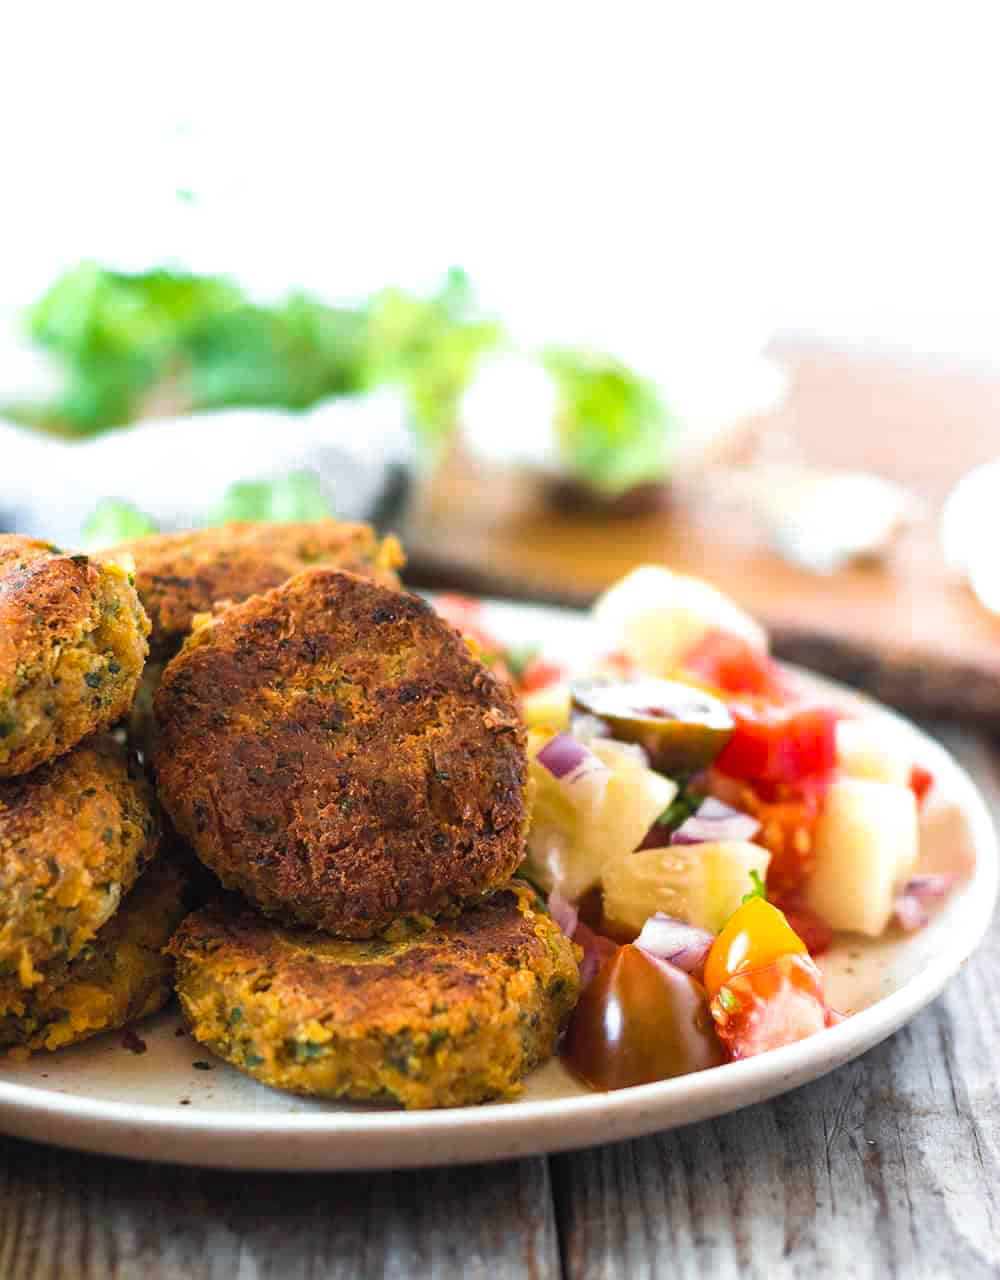 Healthy Vegan Gluten-Free Falafel